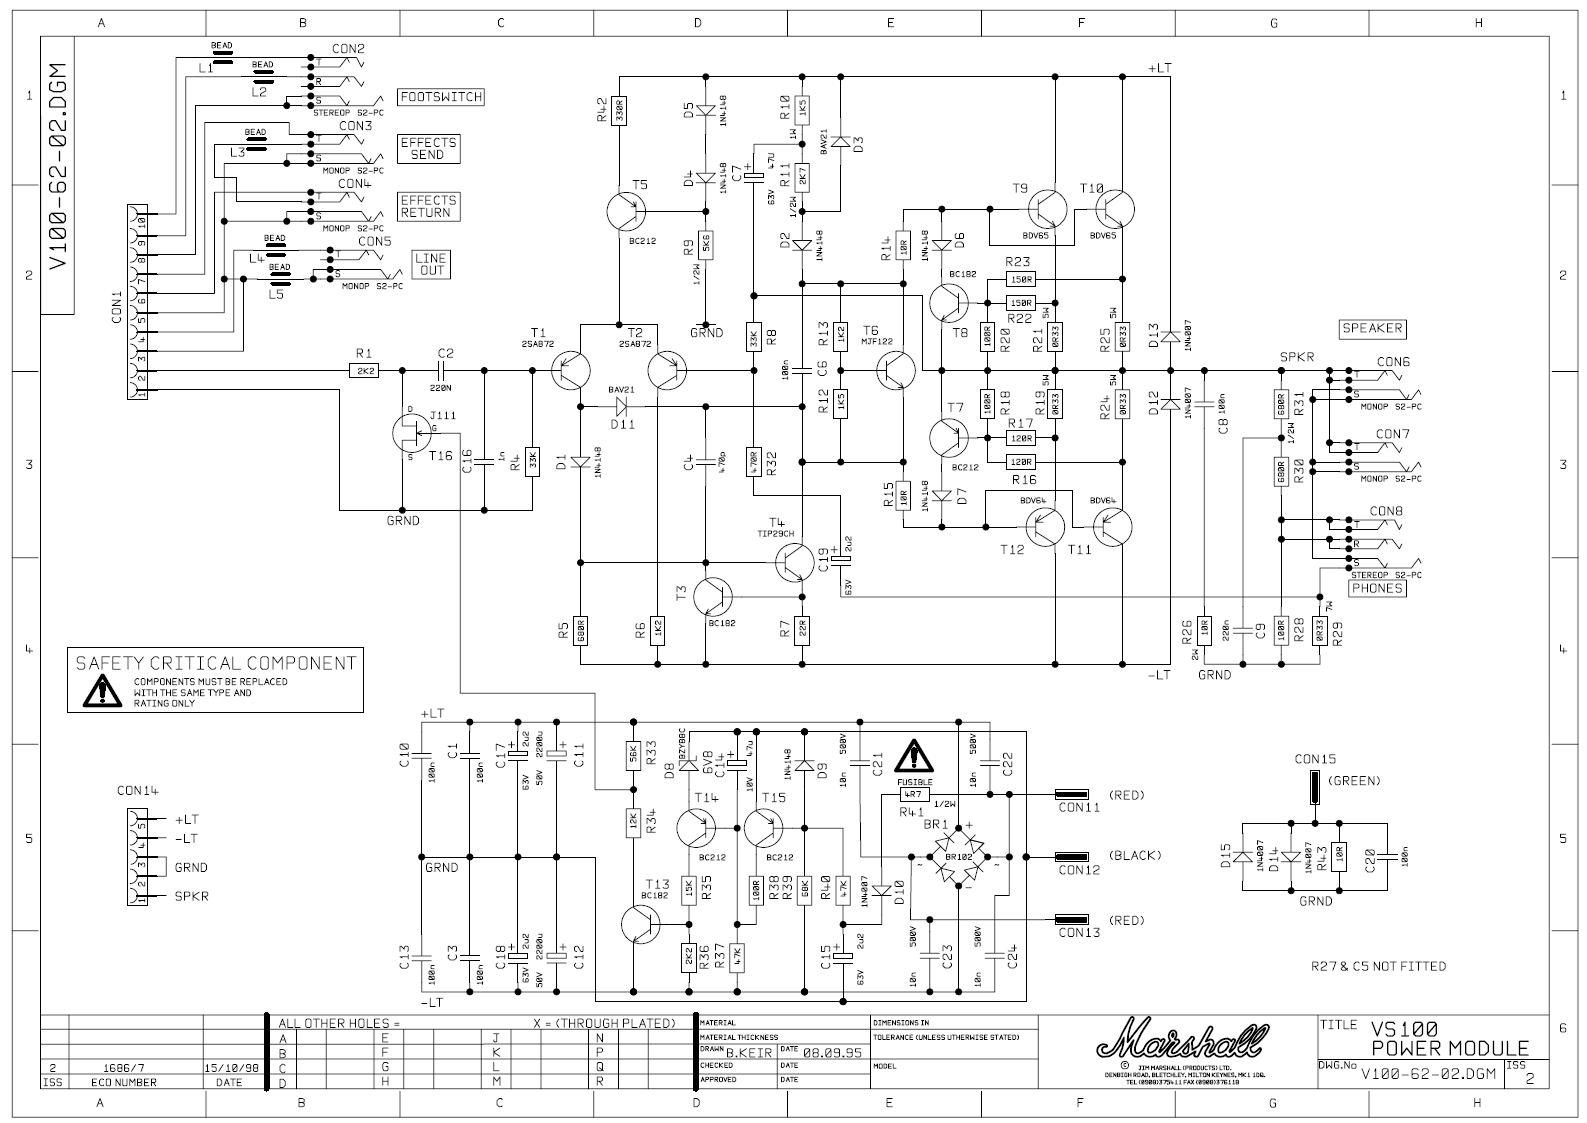 Marshall 8080 Wiring Diagram